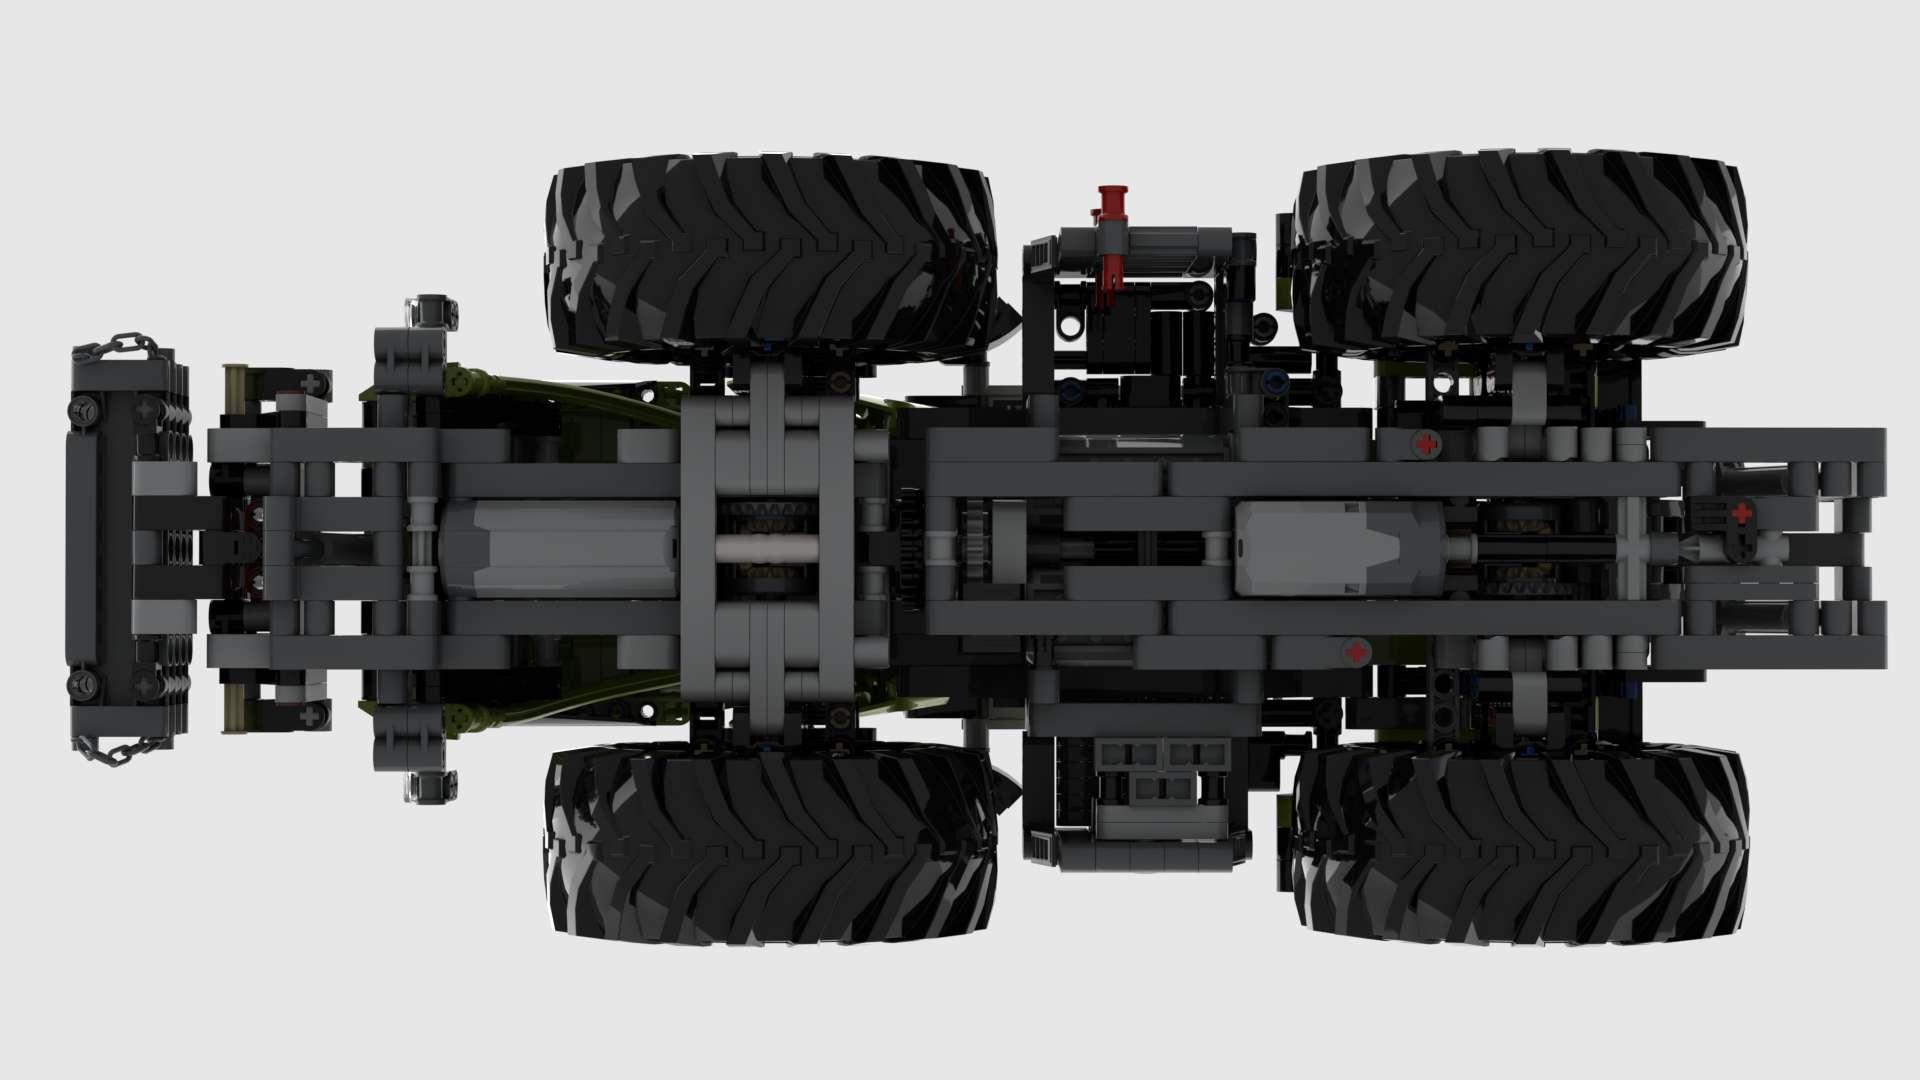 00 42054 Rc Original Xerion 5000 VC 7 Motoren MOD05